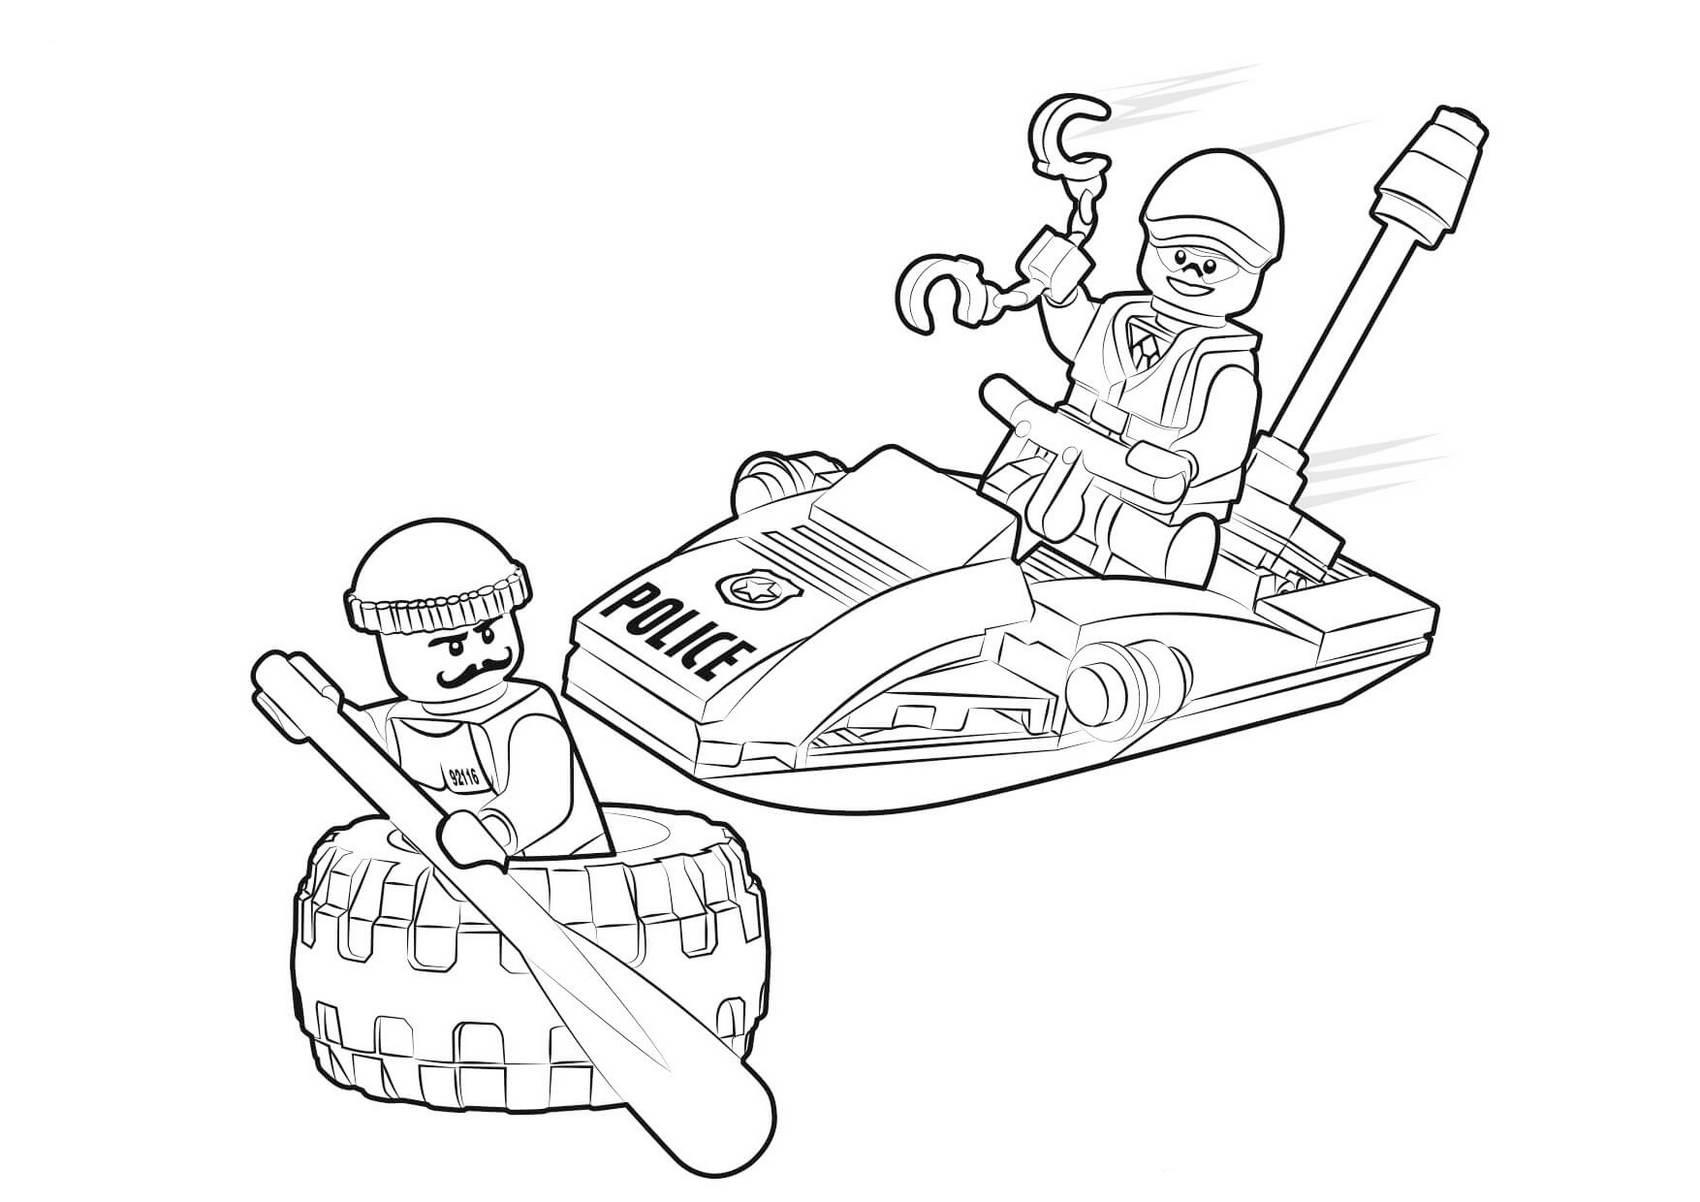 LEGO_police_Coloring_Book